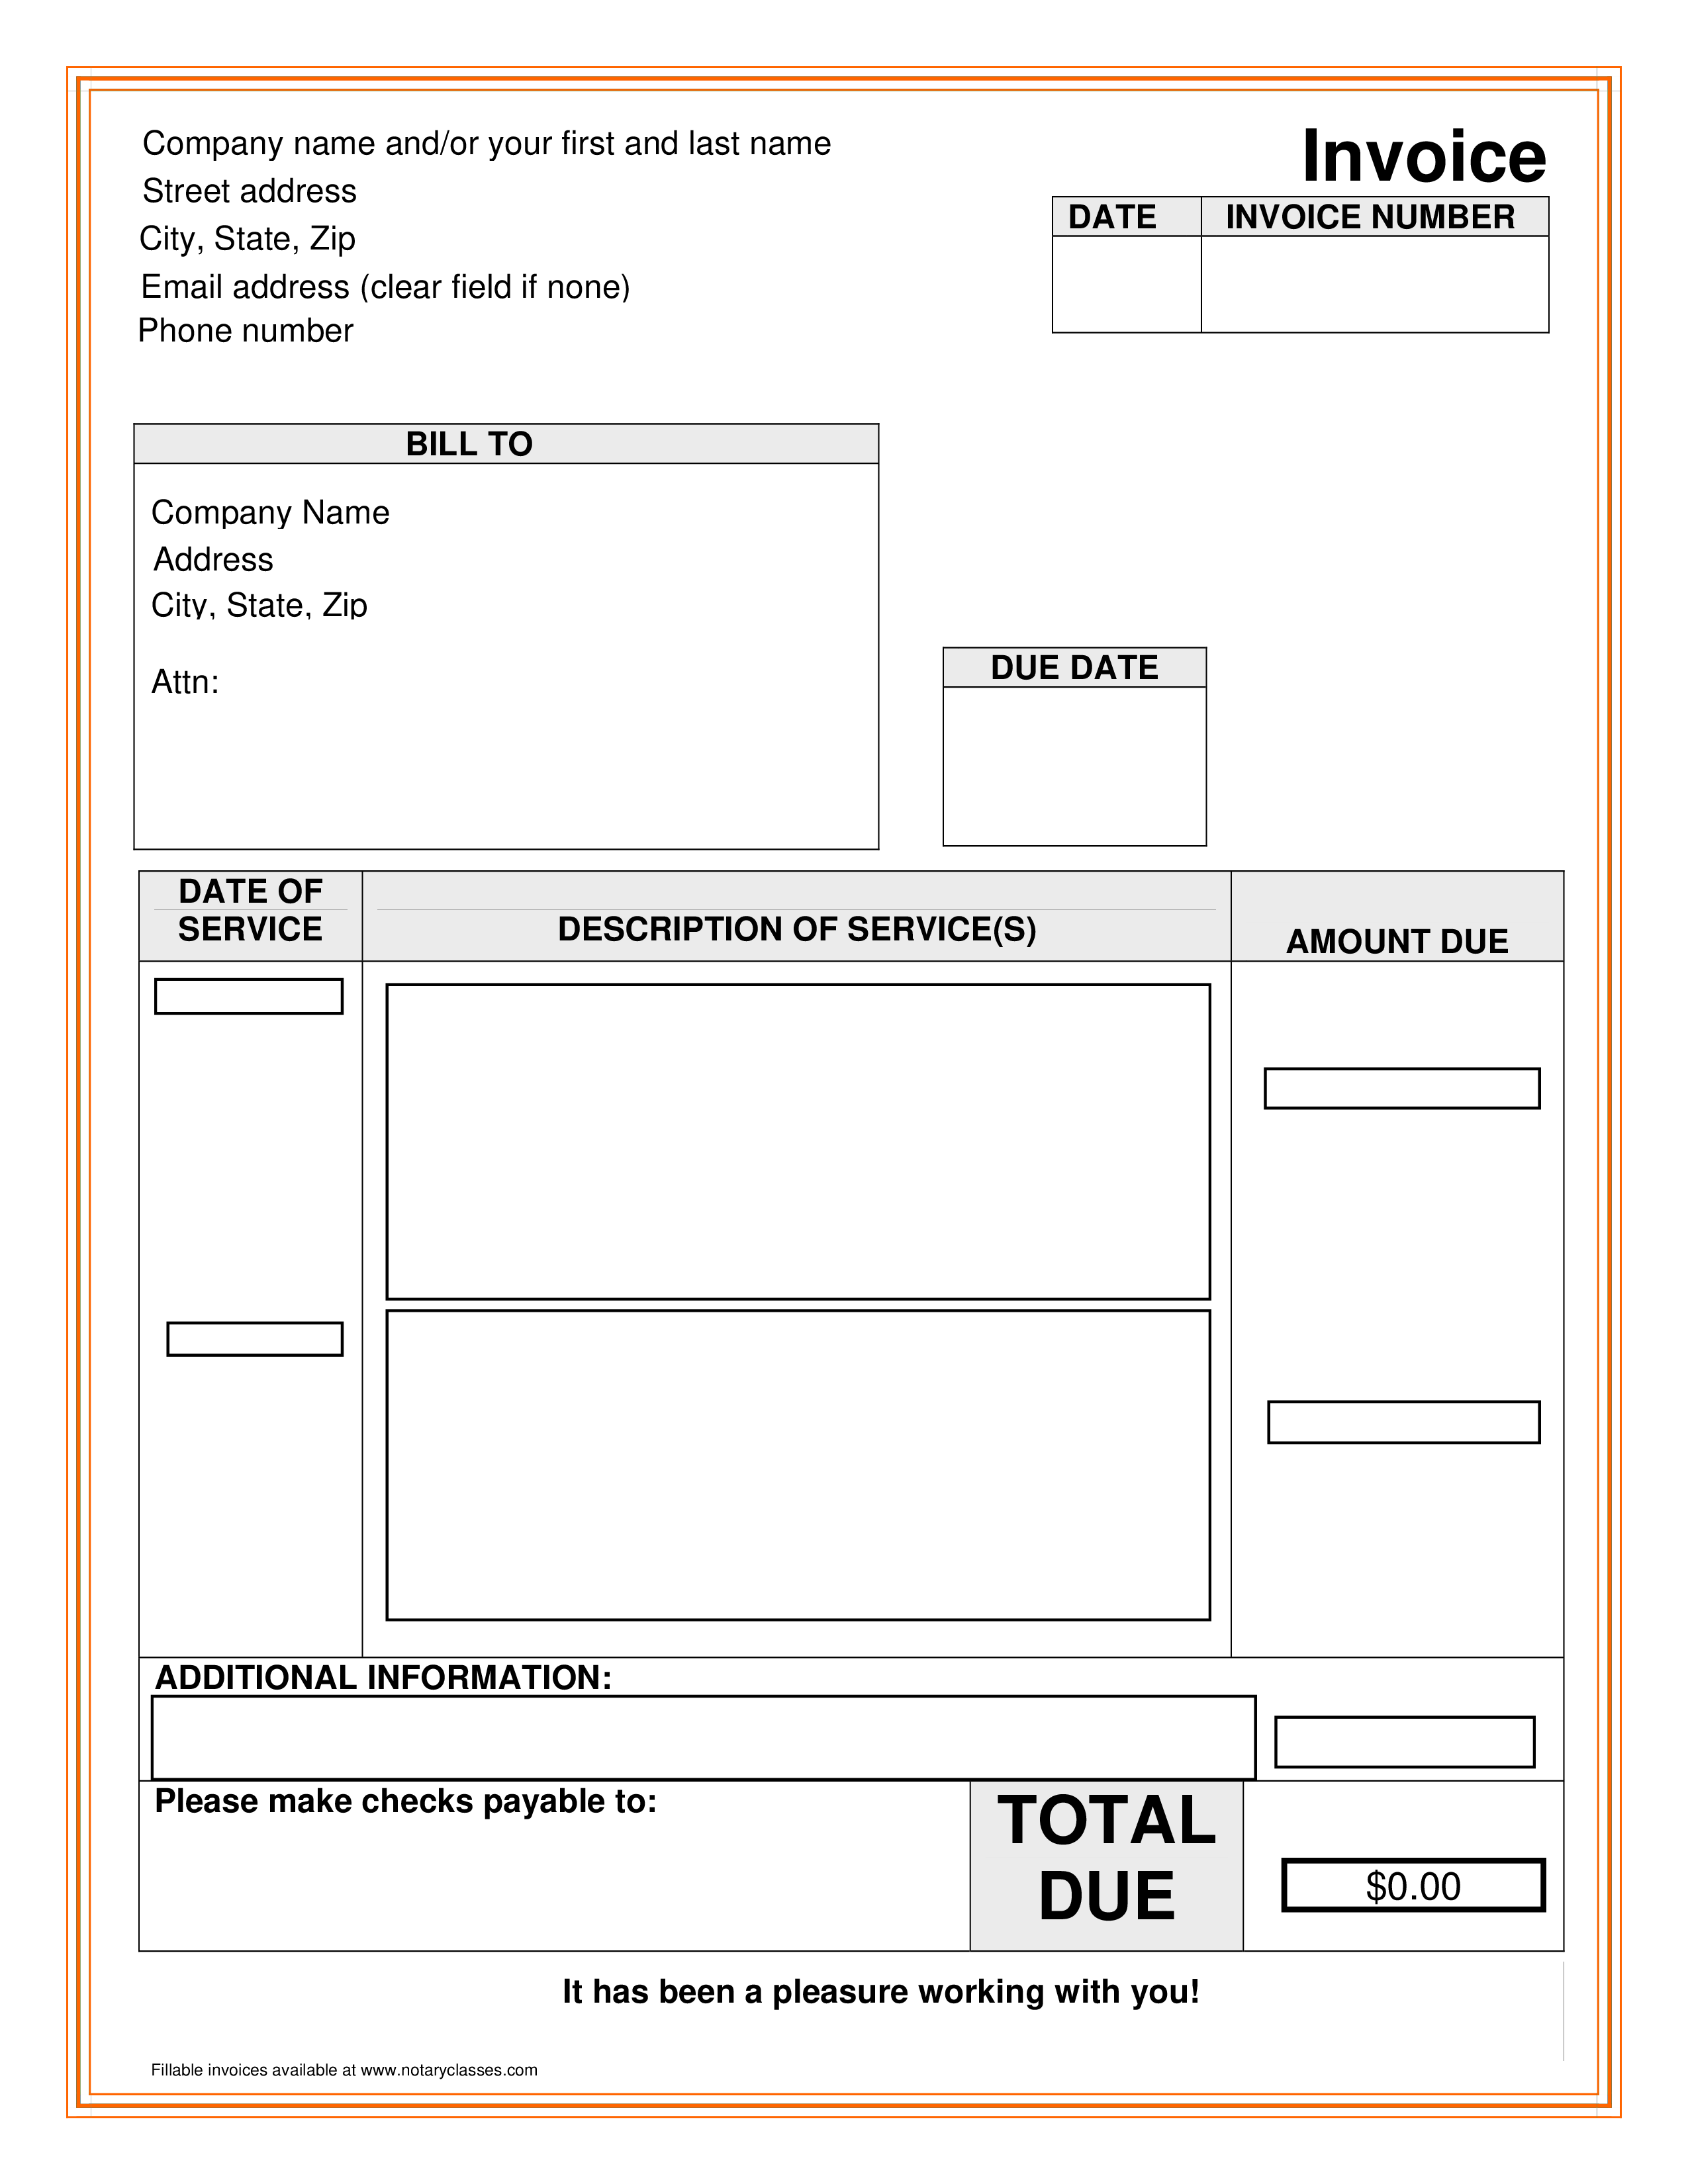 Wonderbaar Blank Billing Invoice - How to create a Billing Invoice? Download CW-11